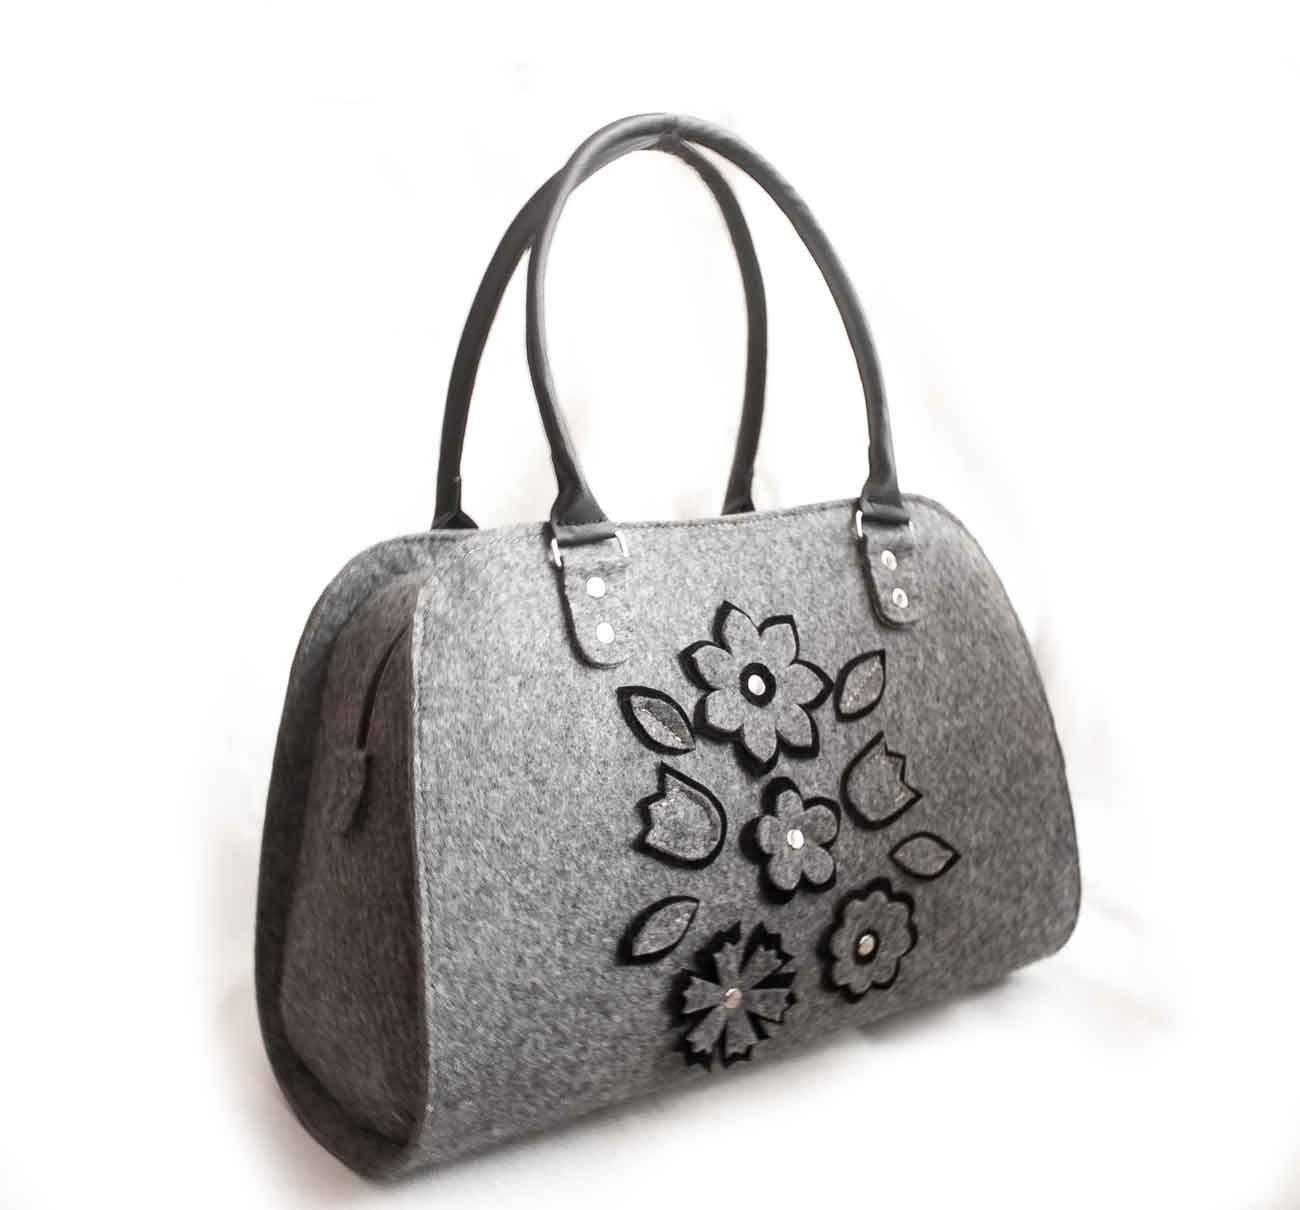 d34ce9b95e ... Ladies felt bag Shopper bag Women s handbag Felted purses Bag lady  Handmade bag Everyday tote bag Medium size bag Floral bag Grey bag by  volaris on Etsy